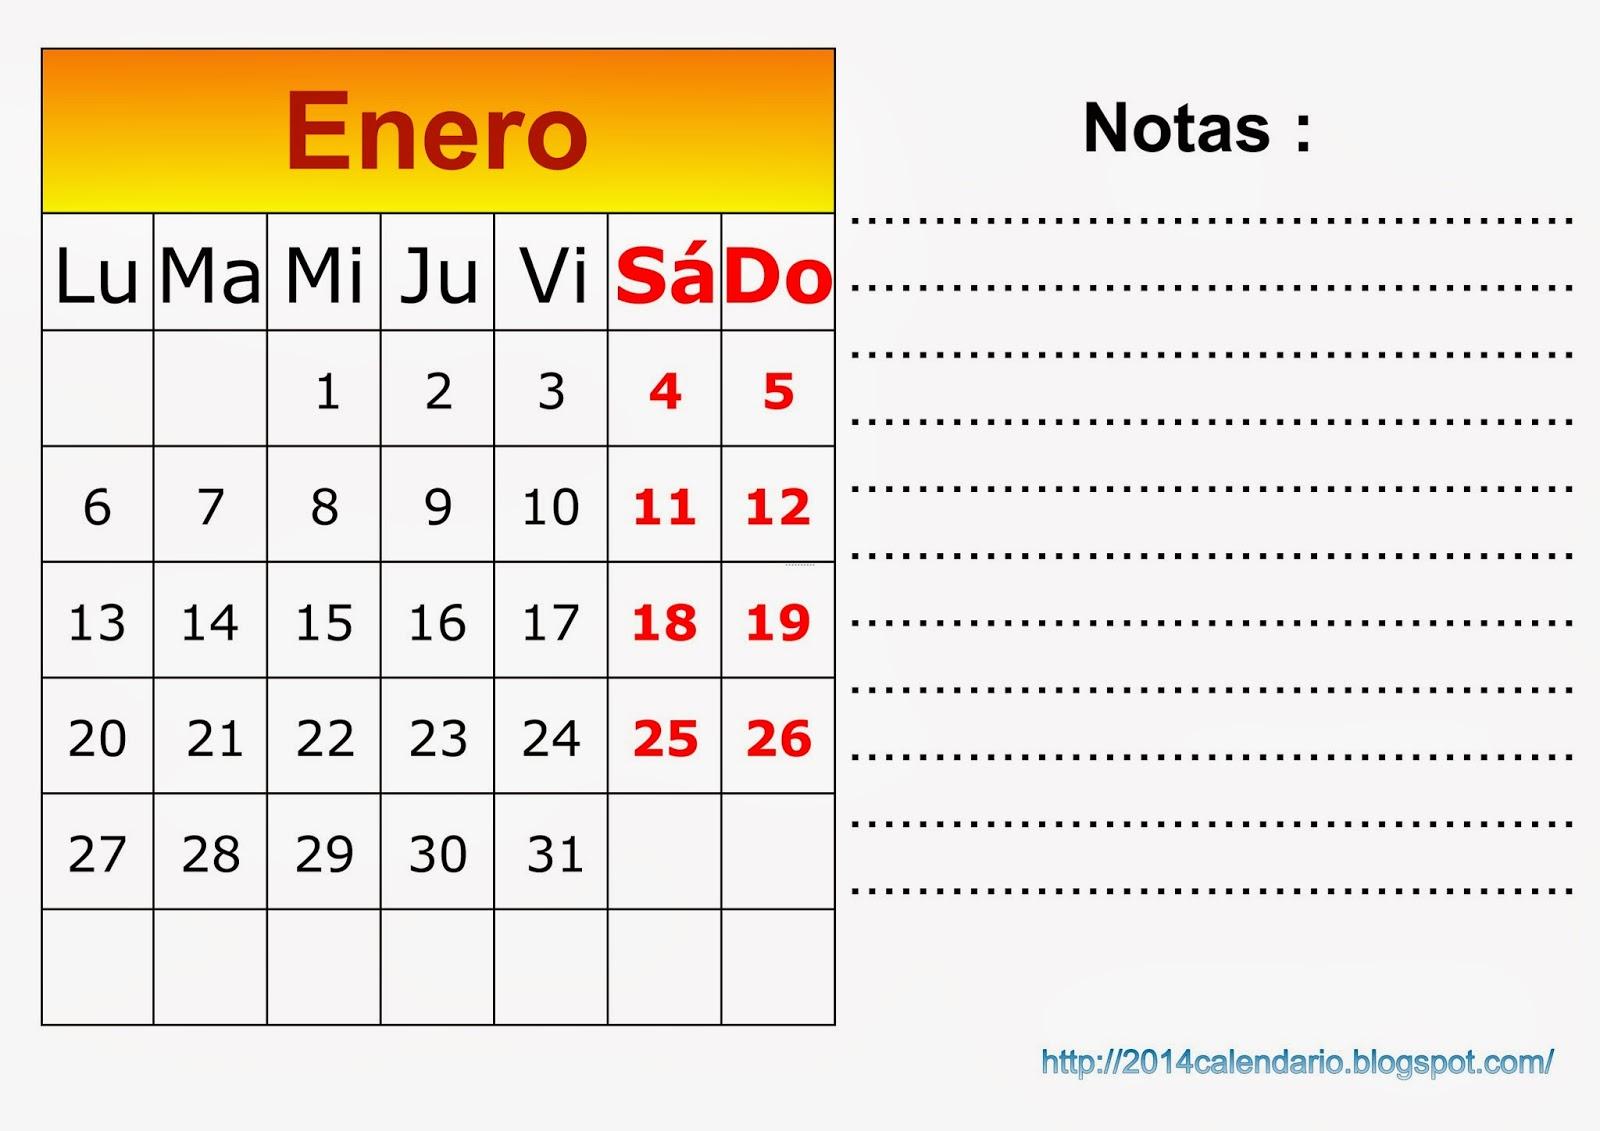 2014 con notas calendario 2014 personalizado con espacio para